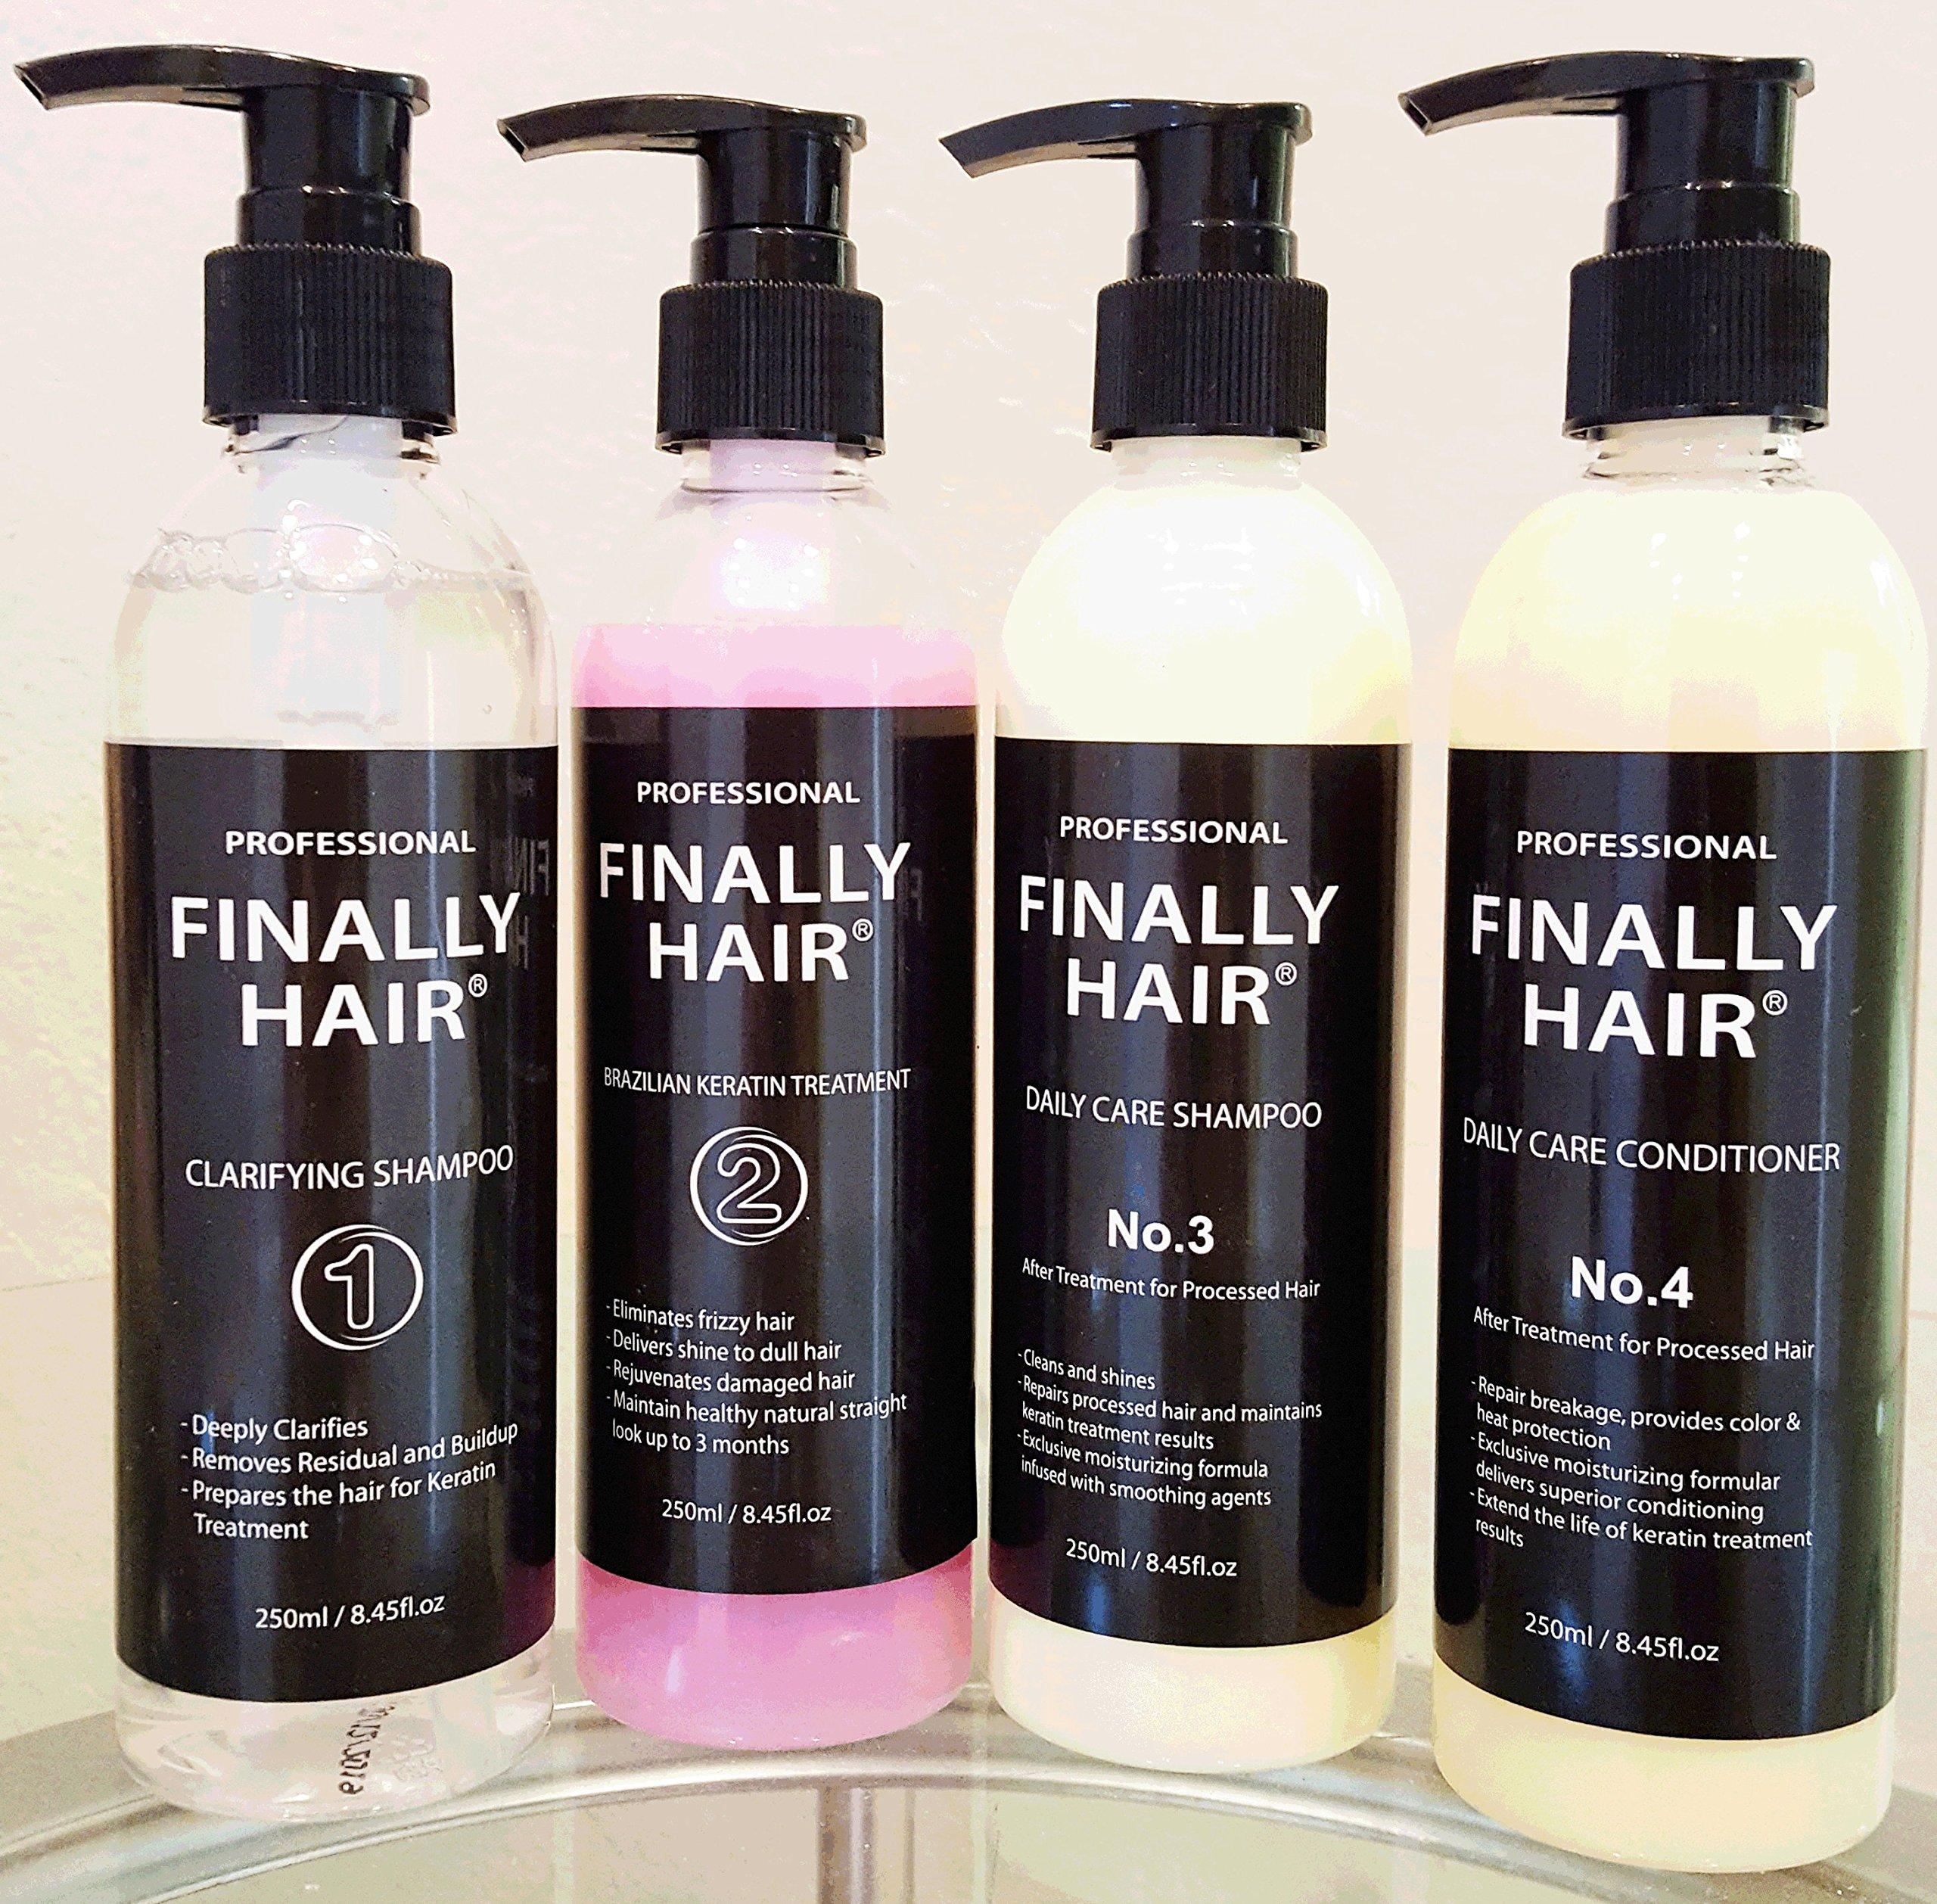 Finally Hair Deluxe Original Version One Keratin Straightening Smoothing Treatment & Clarifying Shampoo Kit 1000ml Professional Kit (Grape Milder Smell)